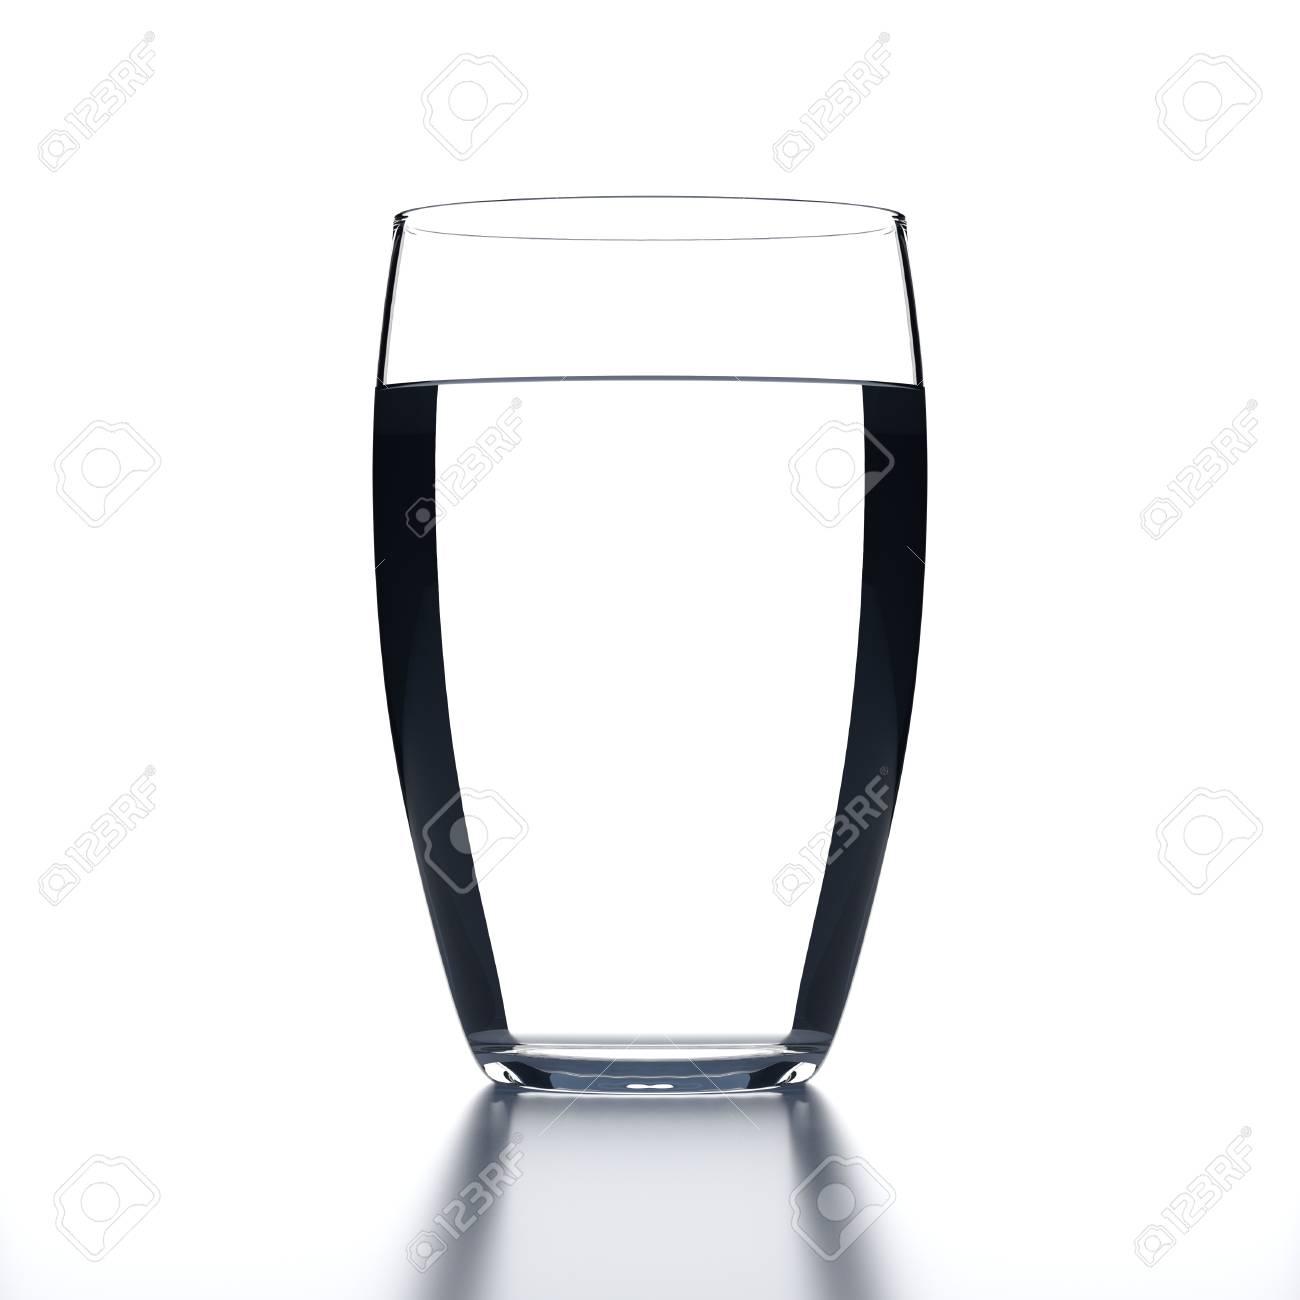 2c86b8b0cfa Full Water Glass on white background. Drinking glassware. 3D illustration.  Stock Illustration -